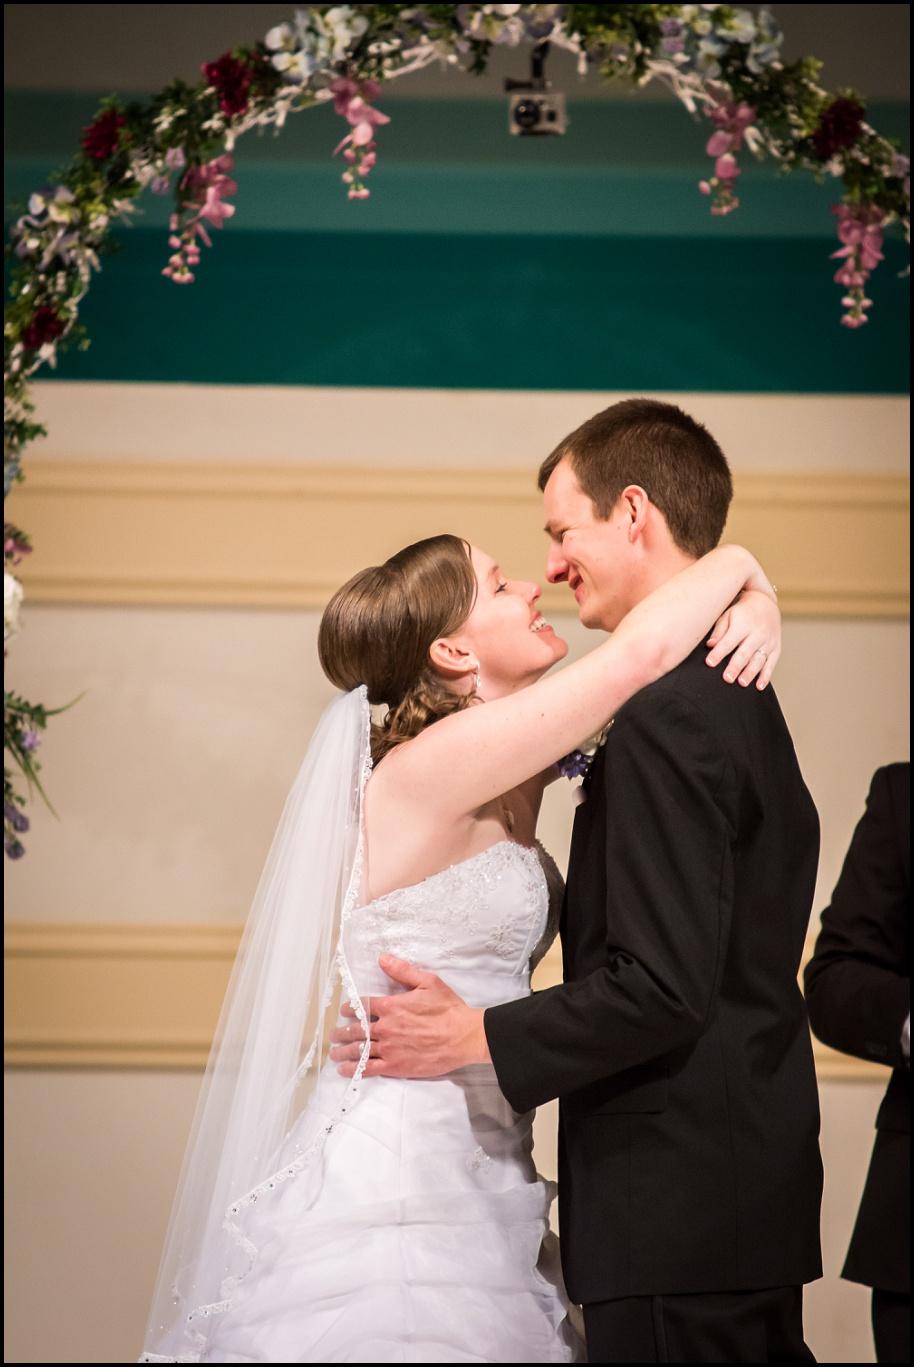 Adams Photography Tidwell Wedding_0012.jpg